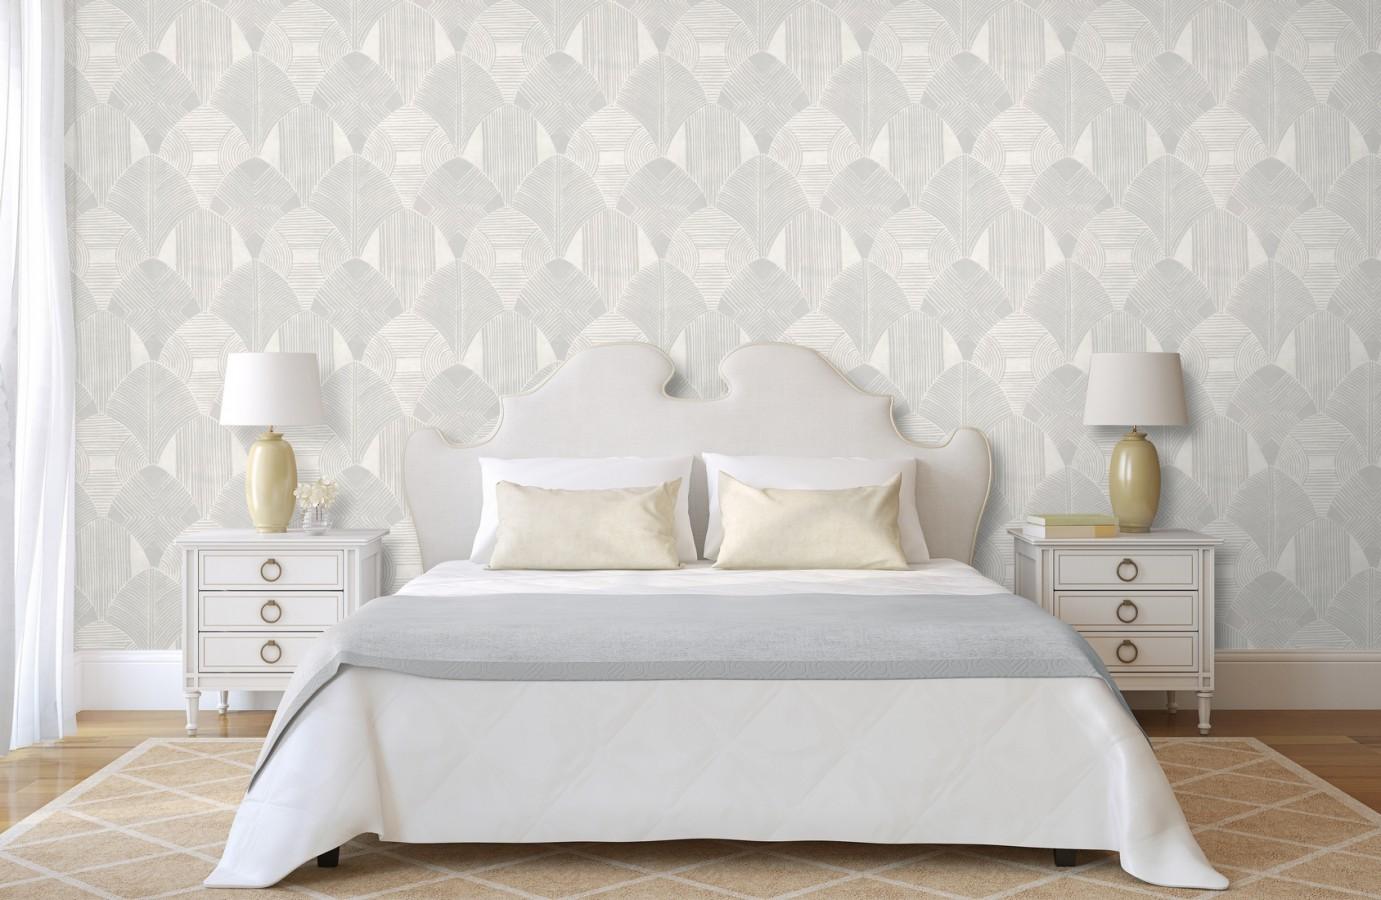 Papel pintado geométrico de estilo étnico Beirut Palace 680851